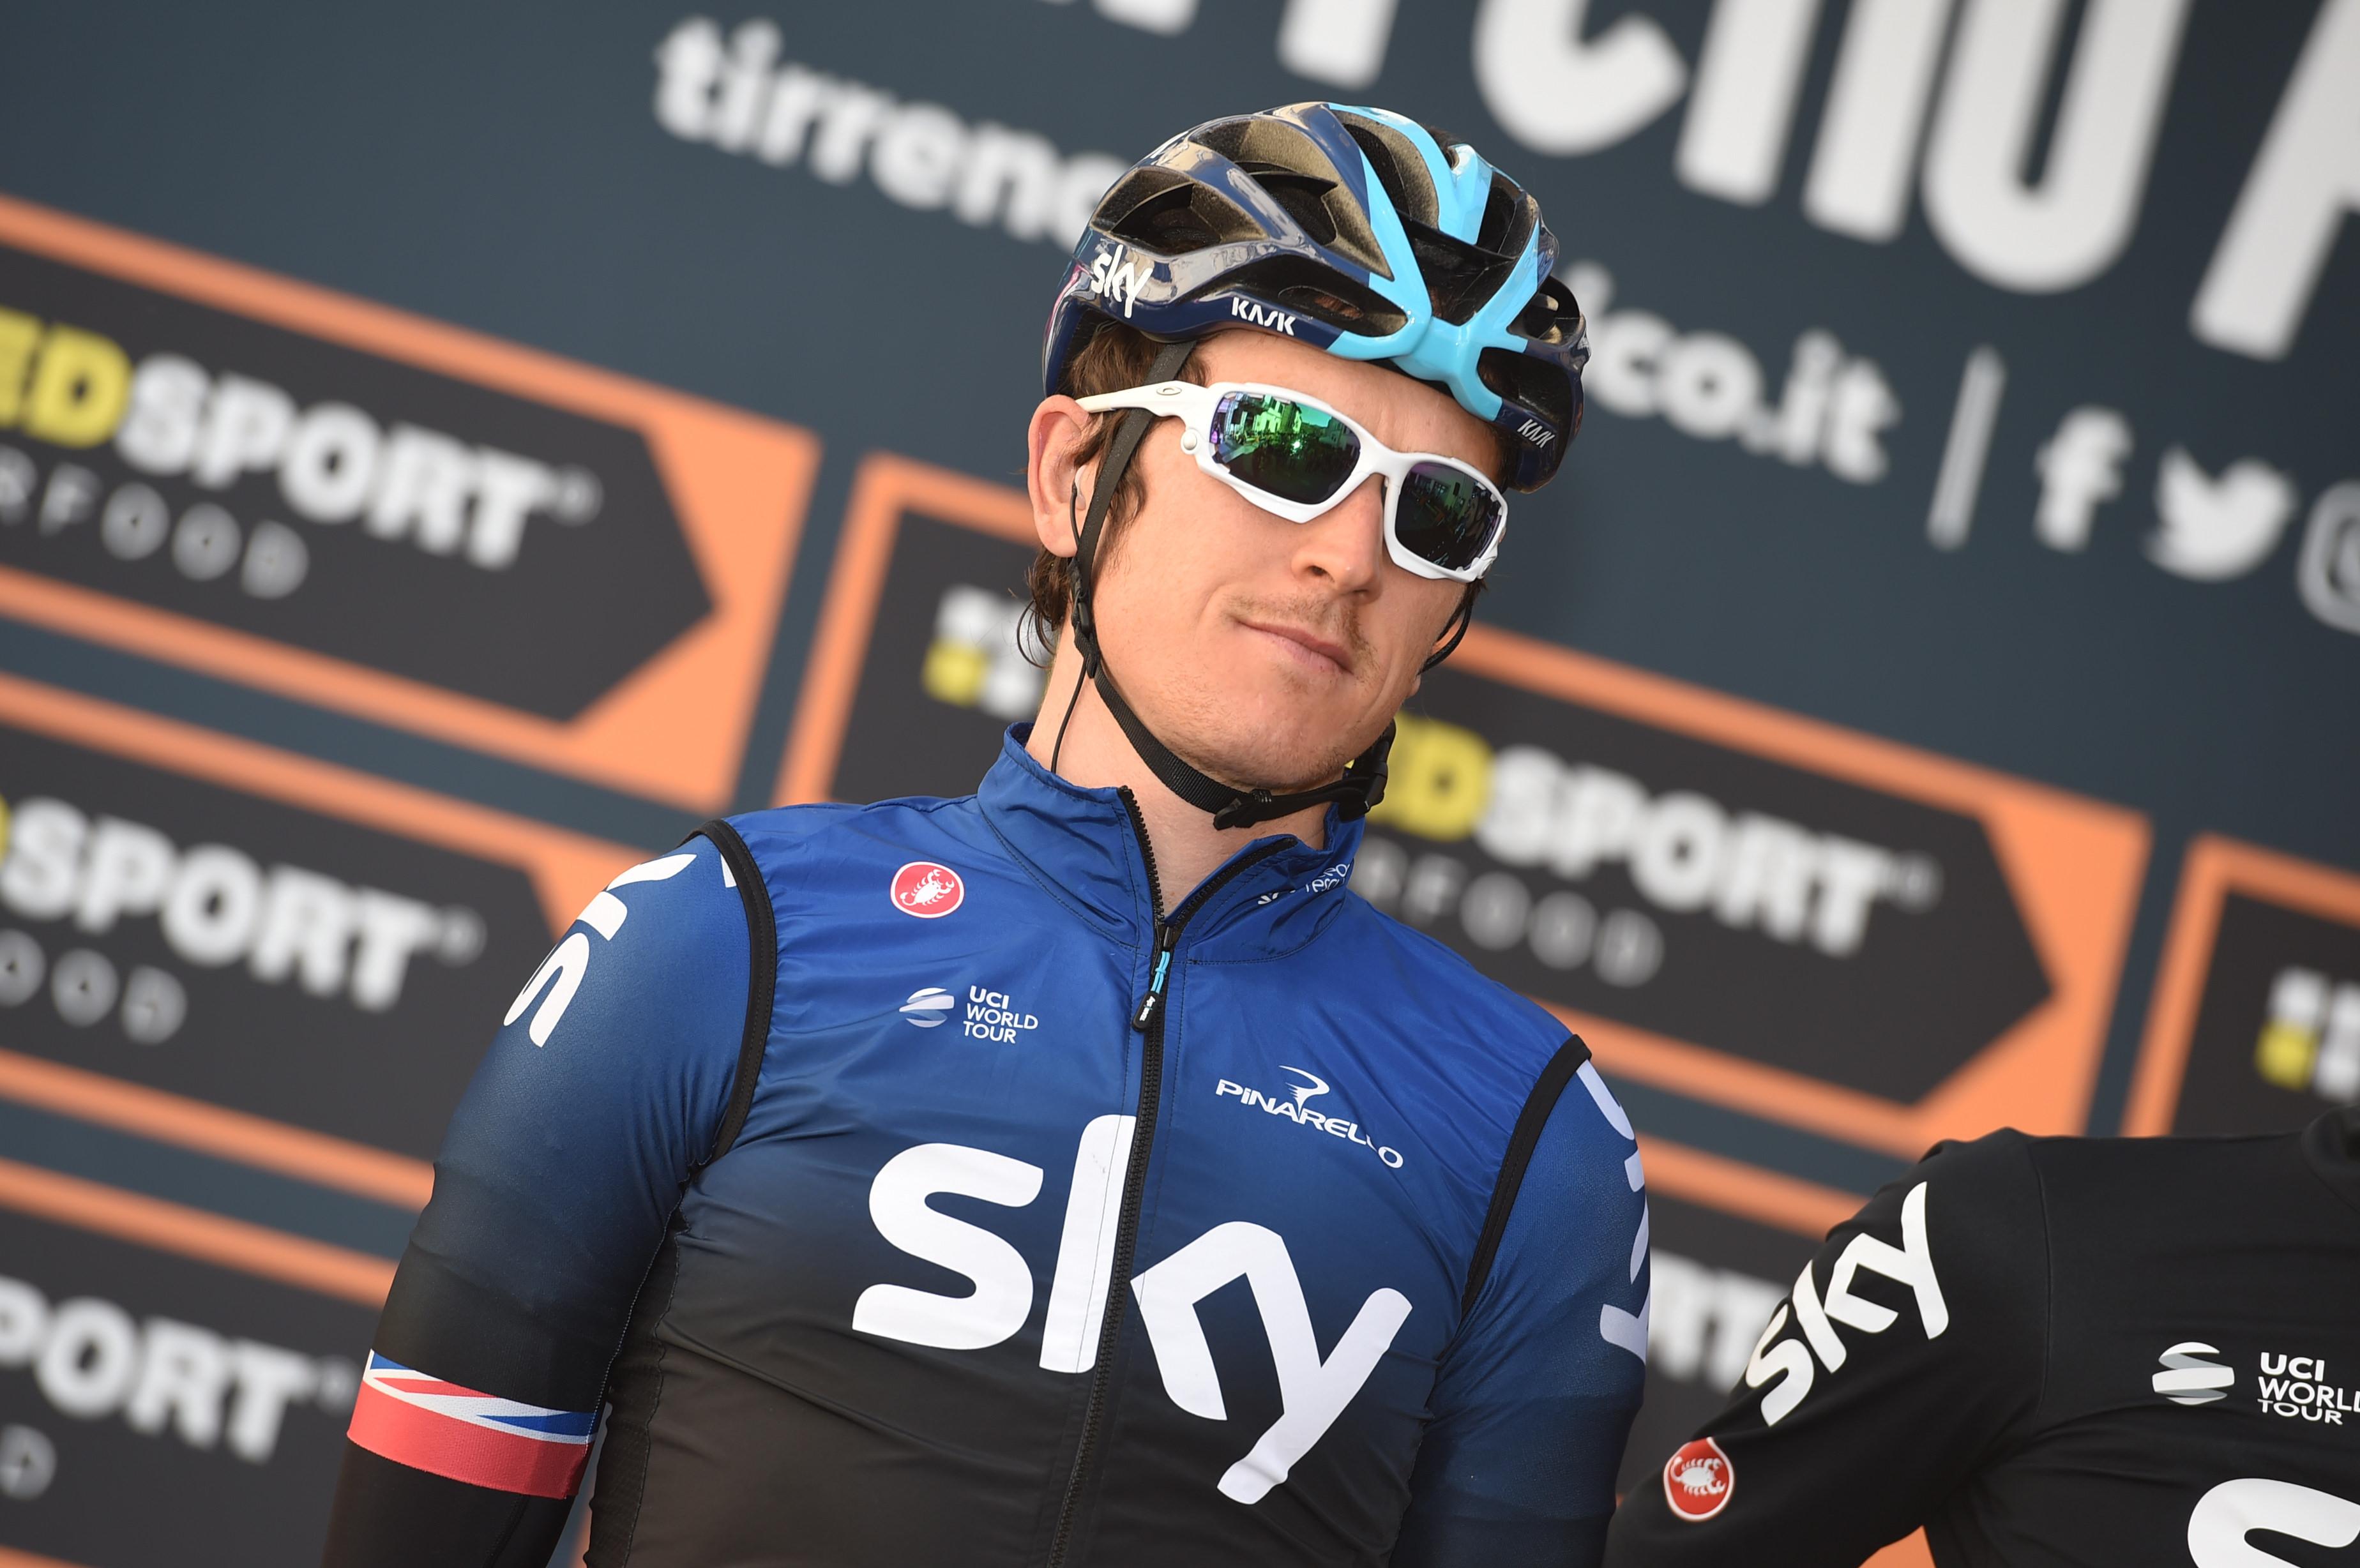 BBC spremlja pot branilca zmage na Touru